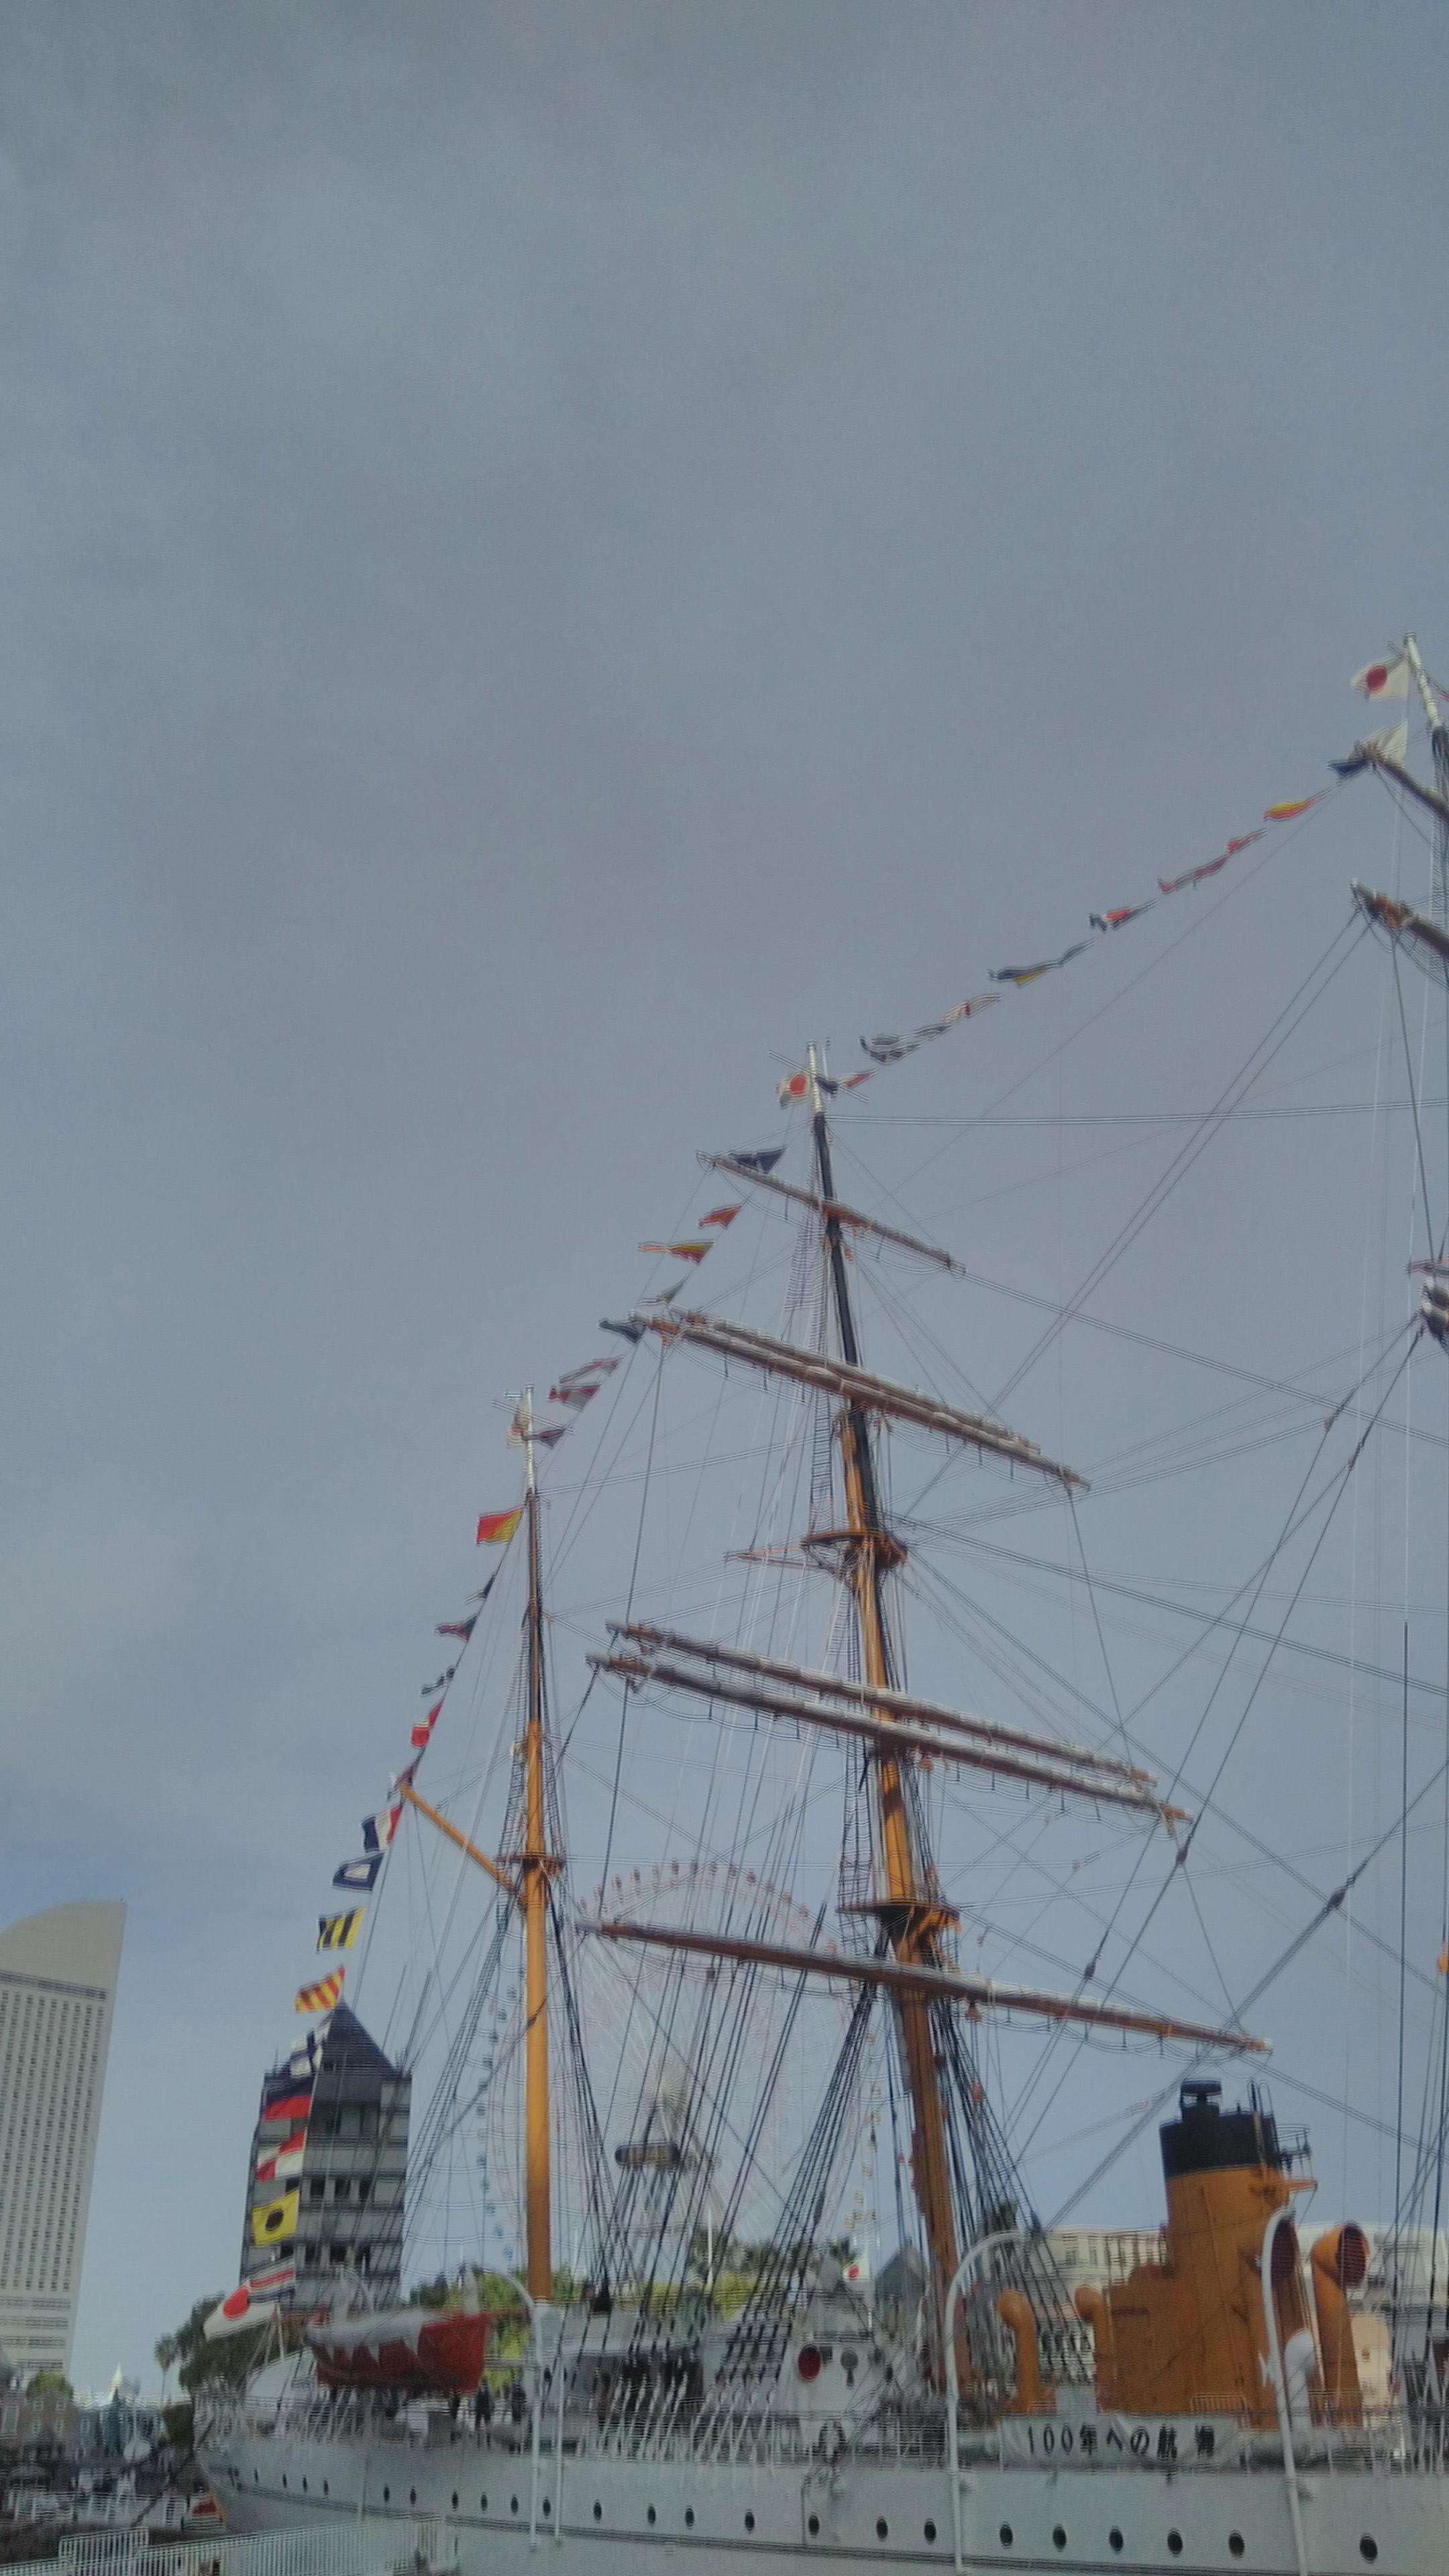 wartime ship. Do you know the name?